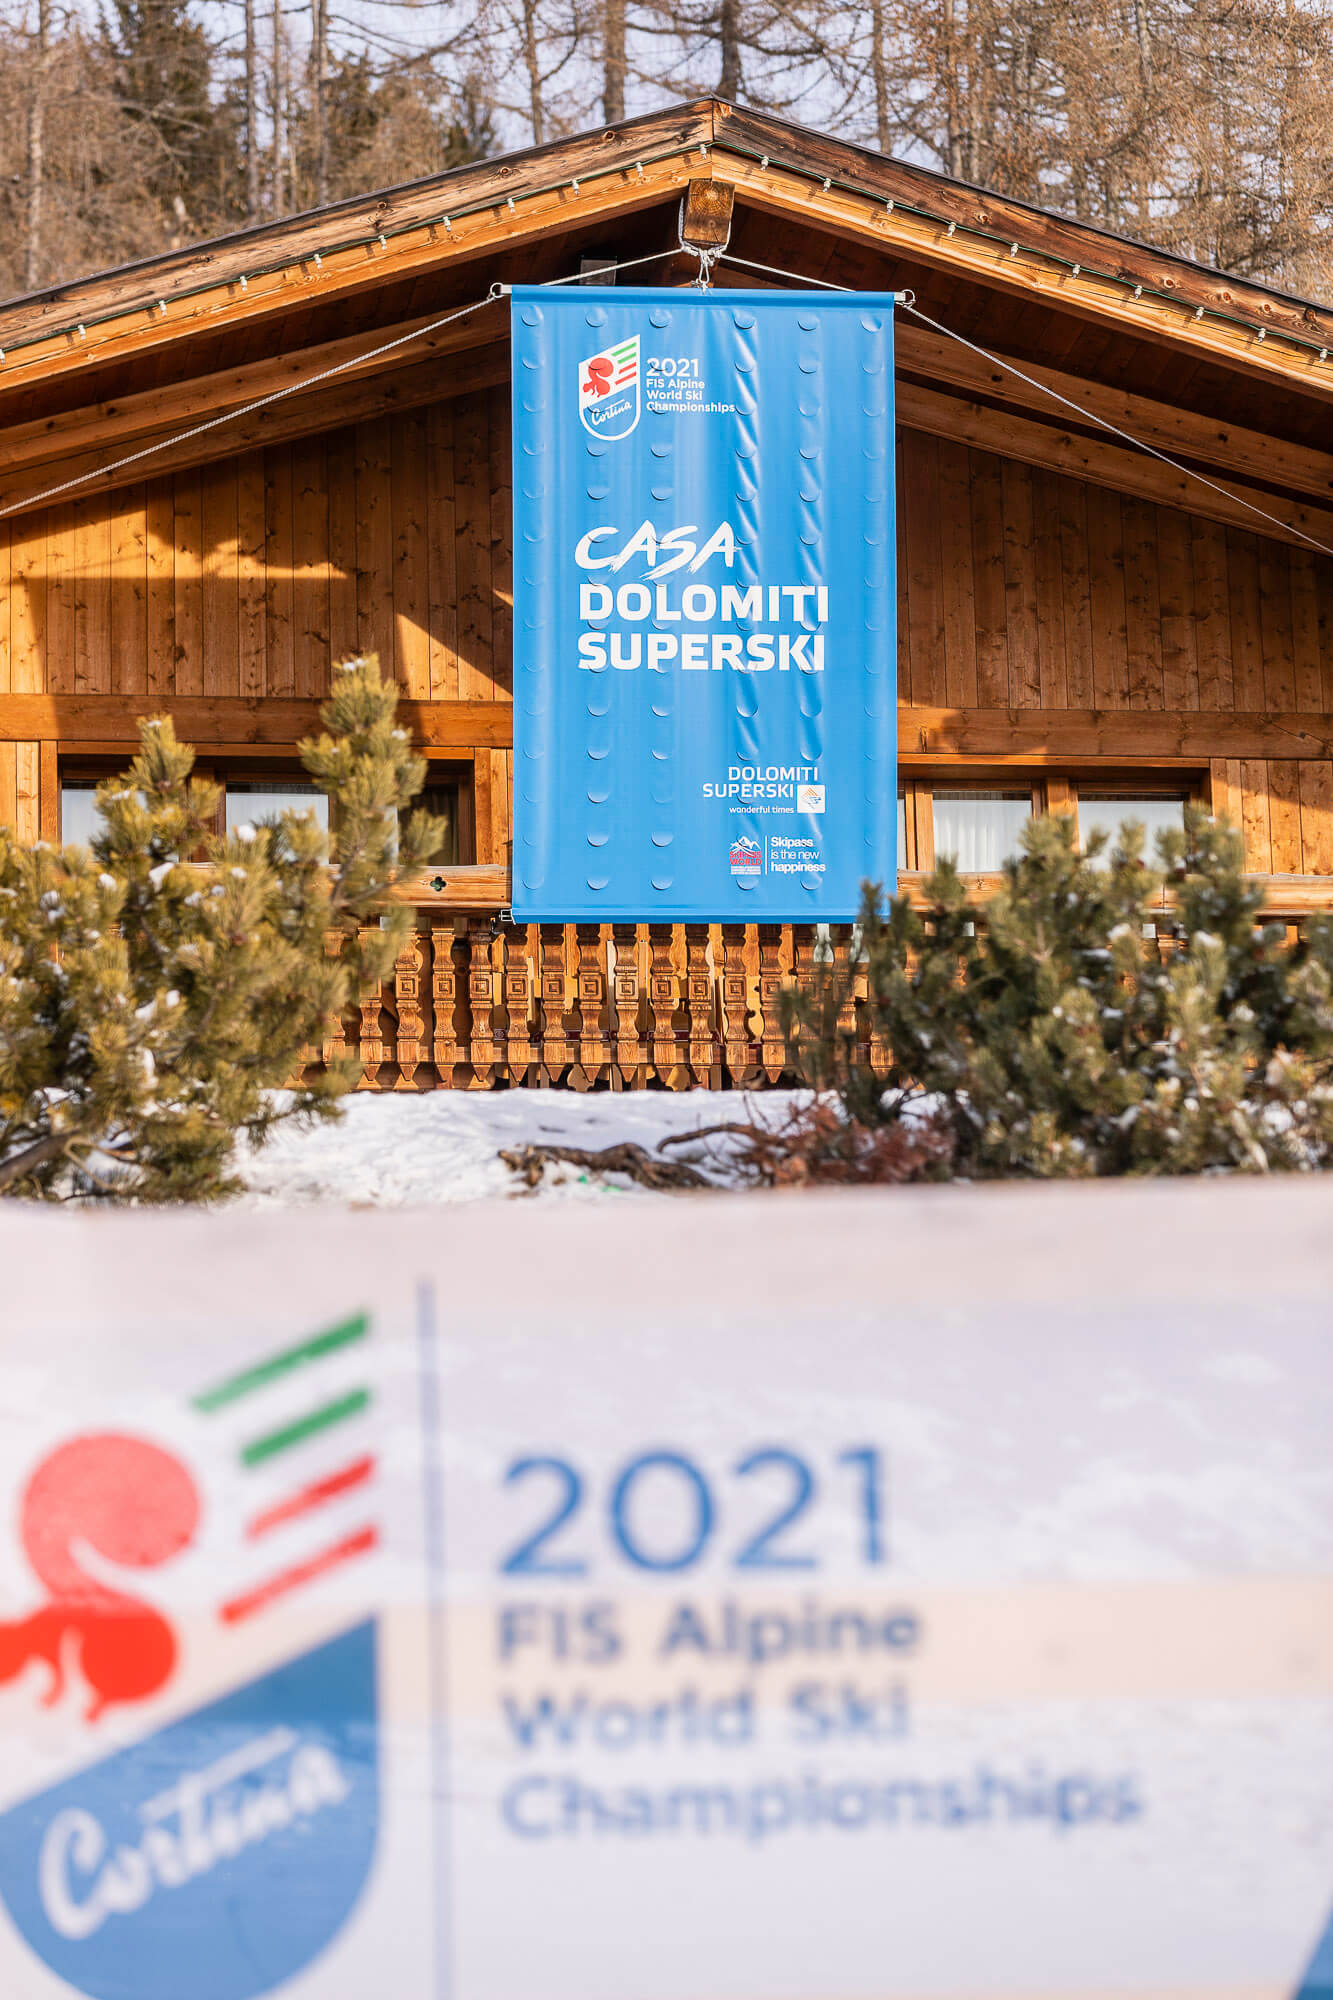 Casa Dolomiti Superski_credit Bandion